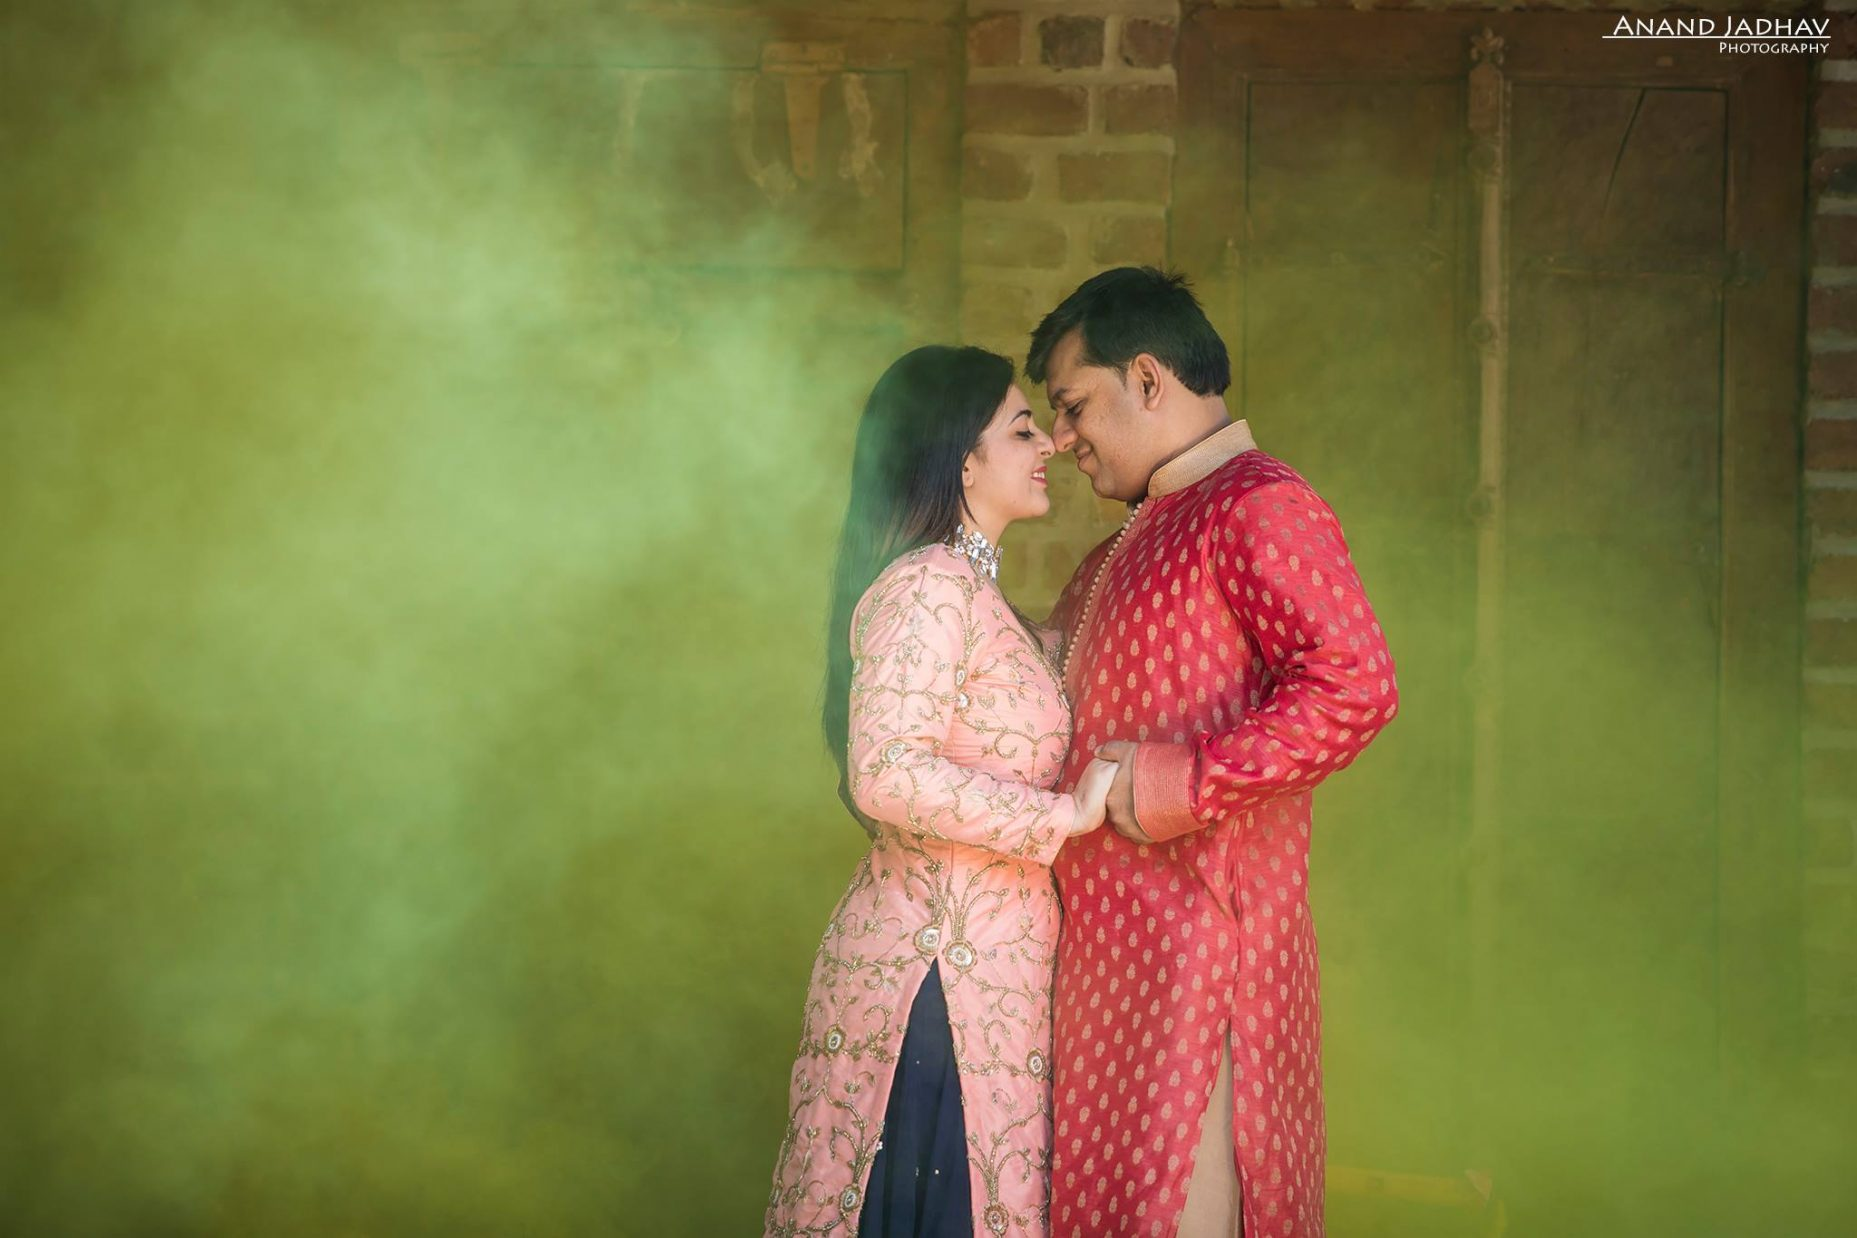 Anandjadhav_Prewedding (90)